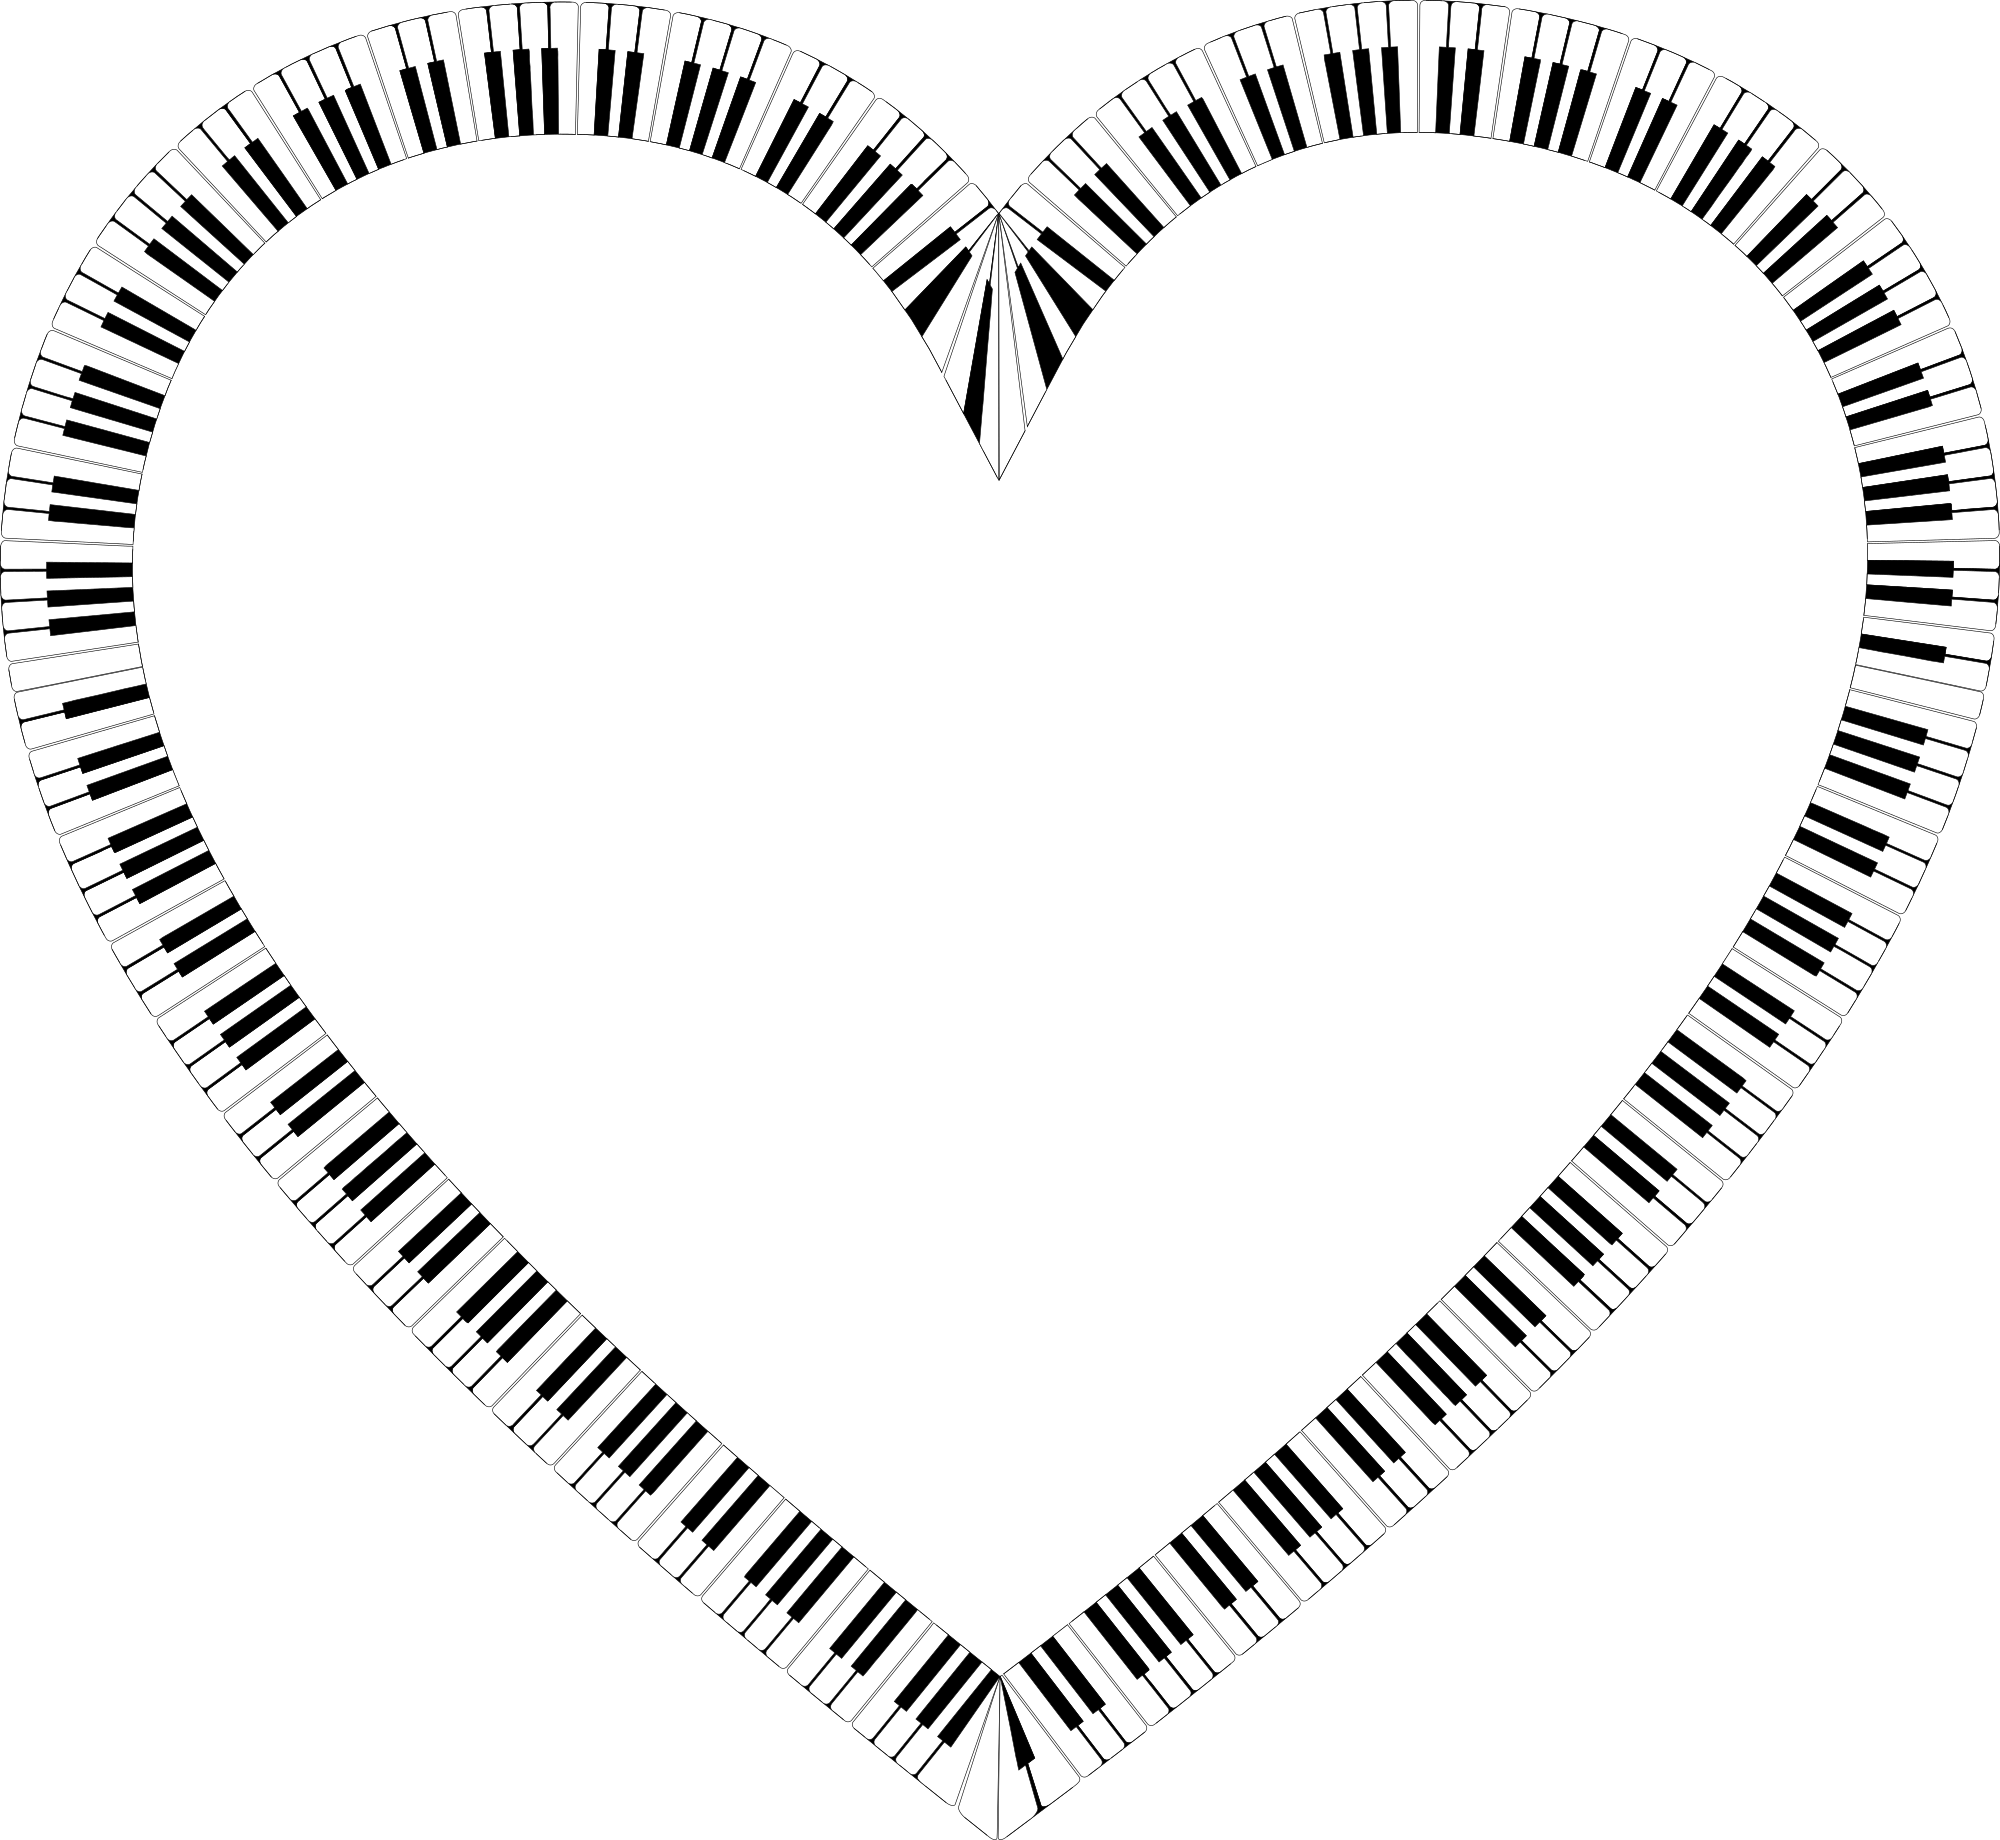 Free keys shape png. Piano clipart heart